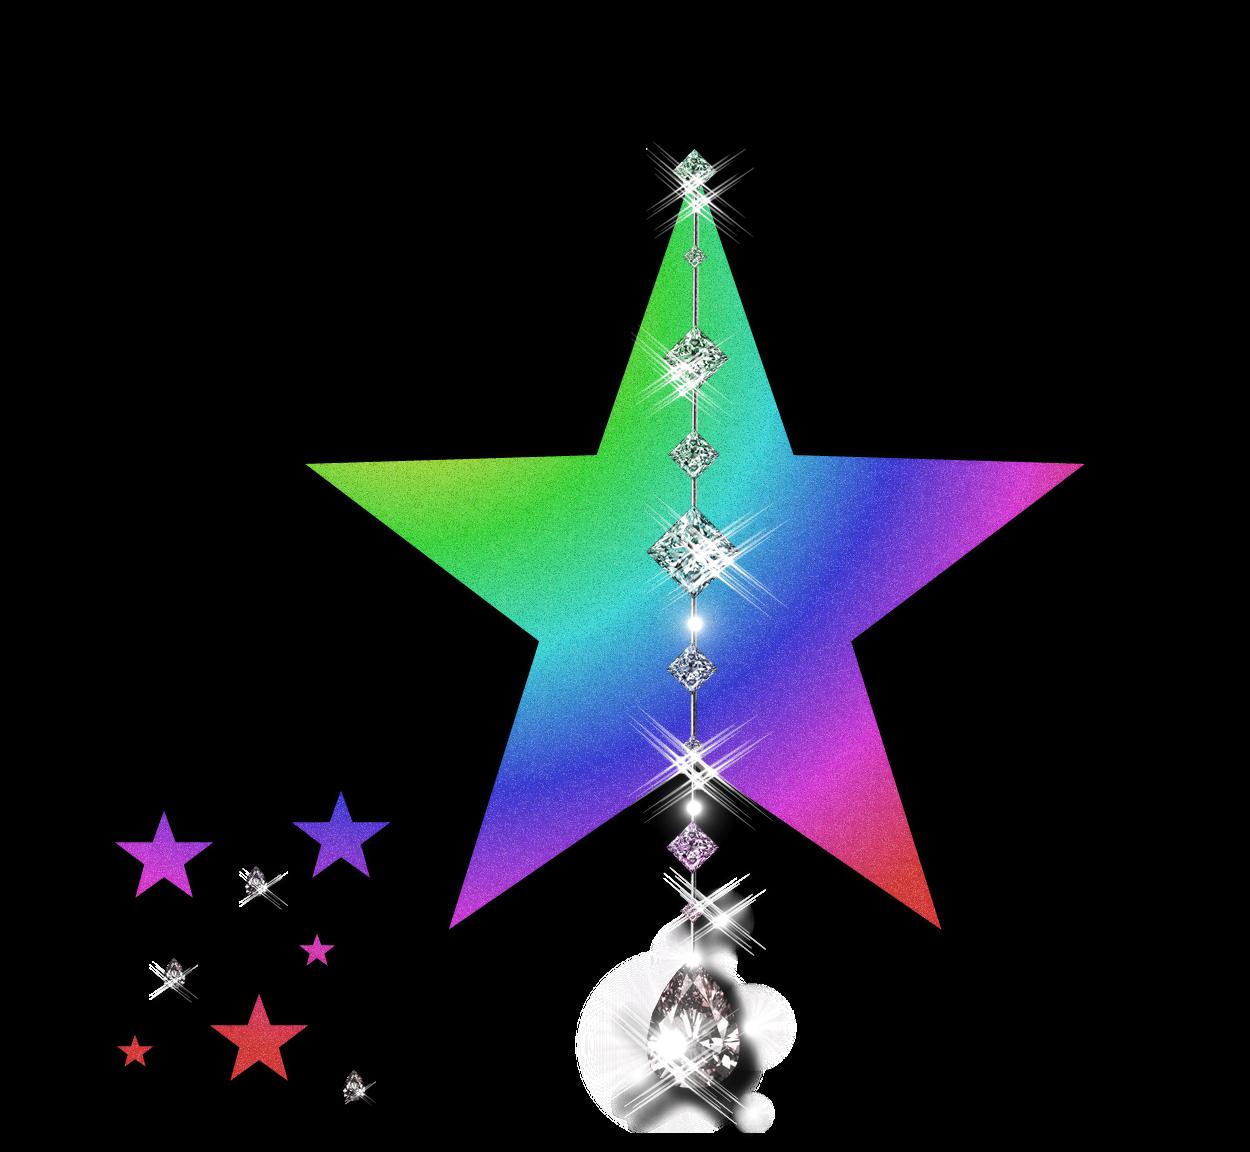 1250x1152 Stars Clipart Colourful Star